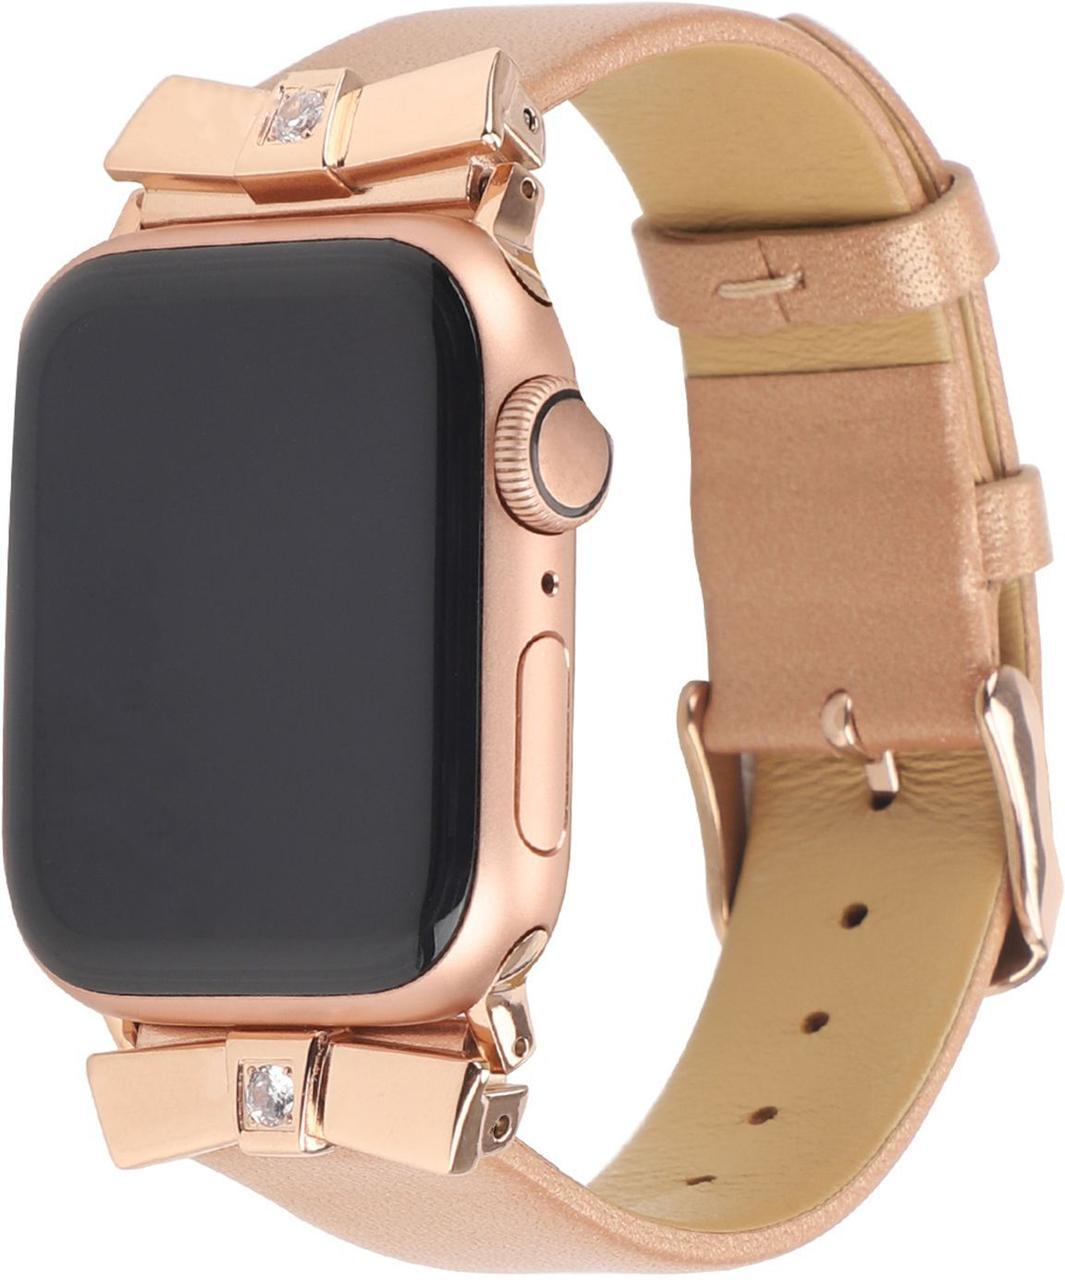 Ремешок из кожи Promate Scepter-38ML для Apple Watch 38-40 мм Gold